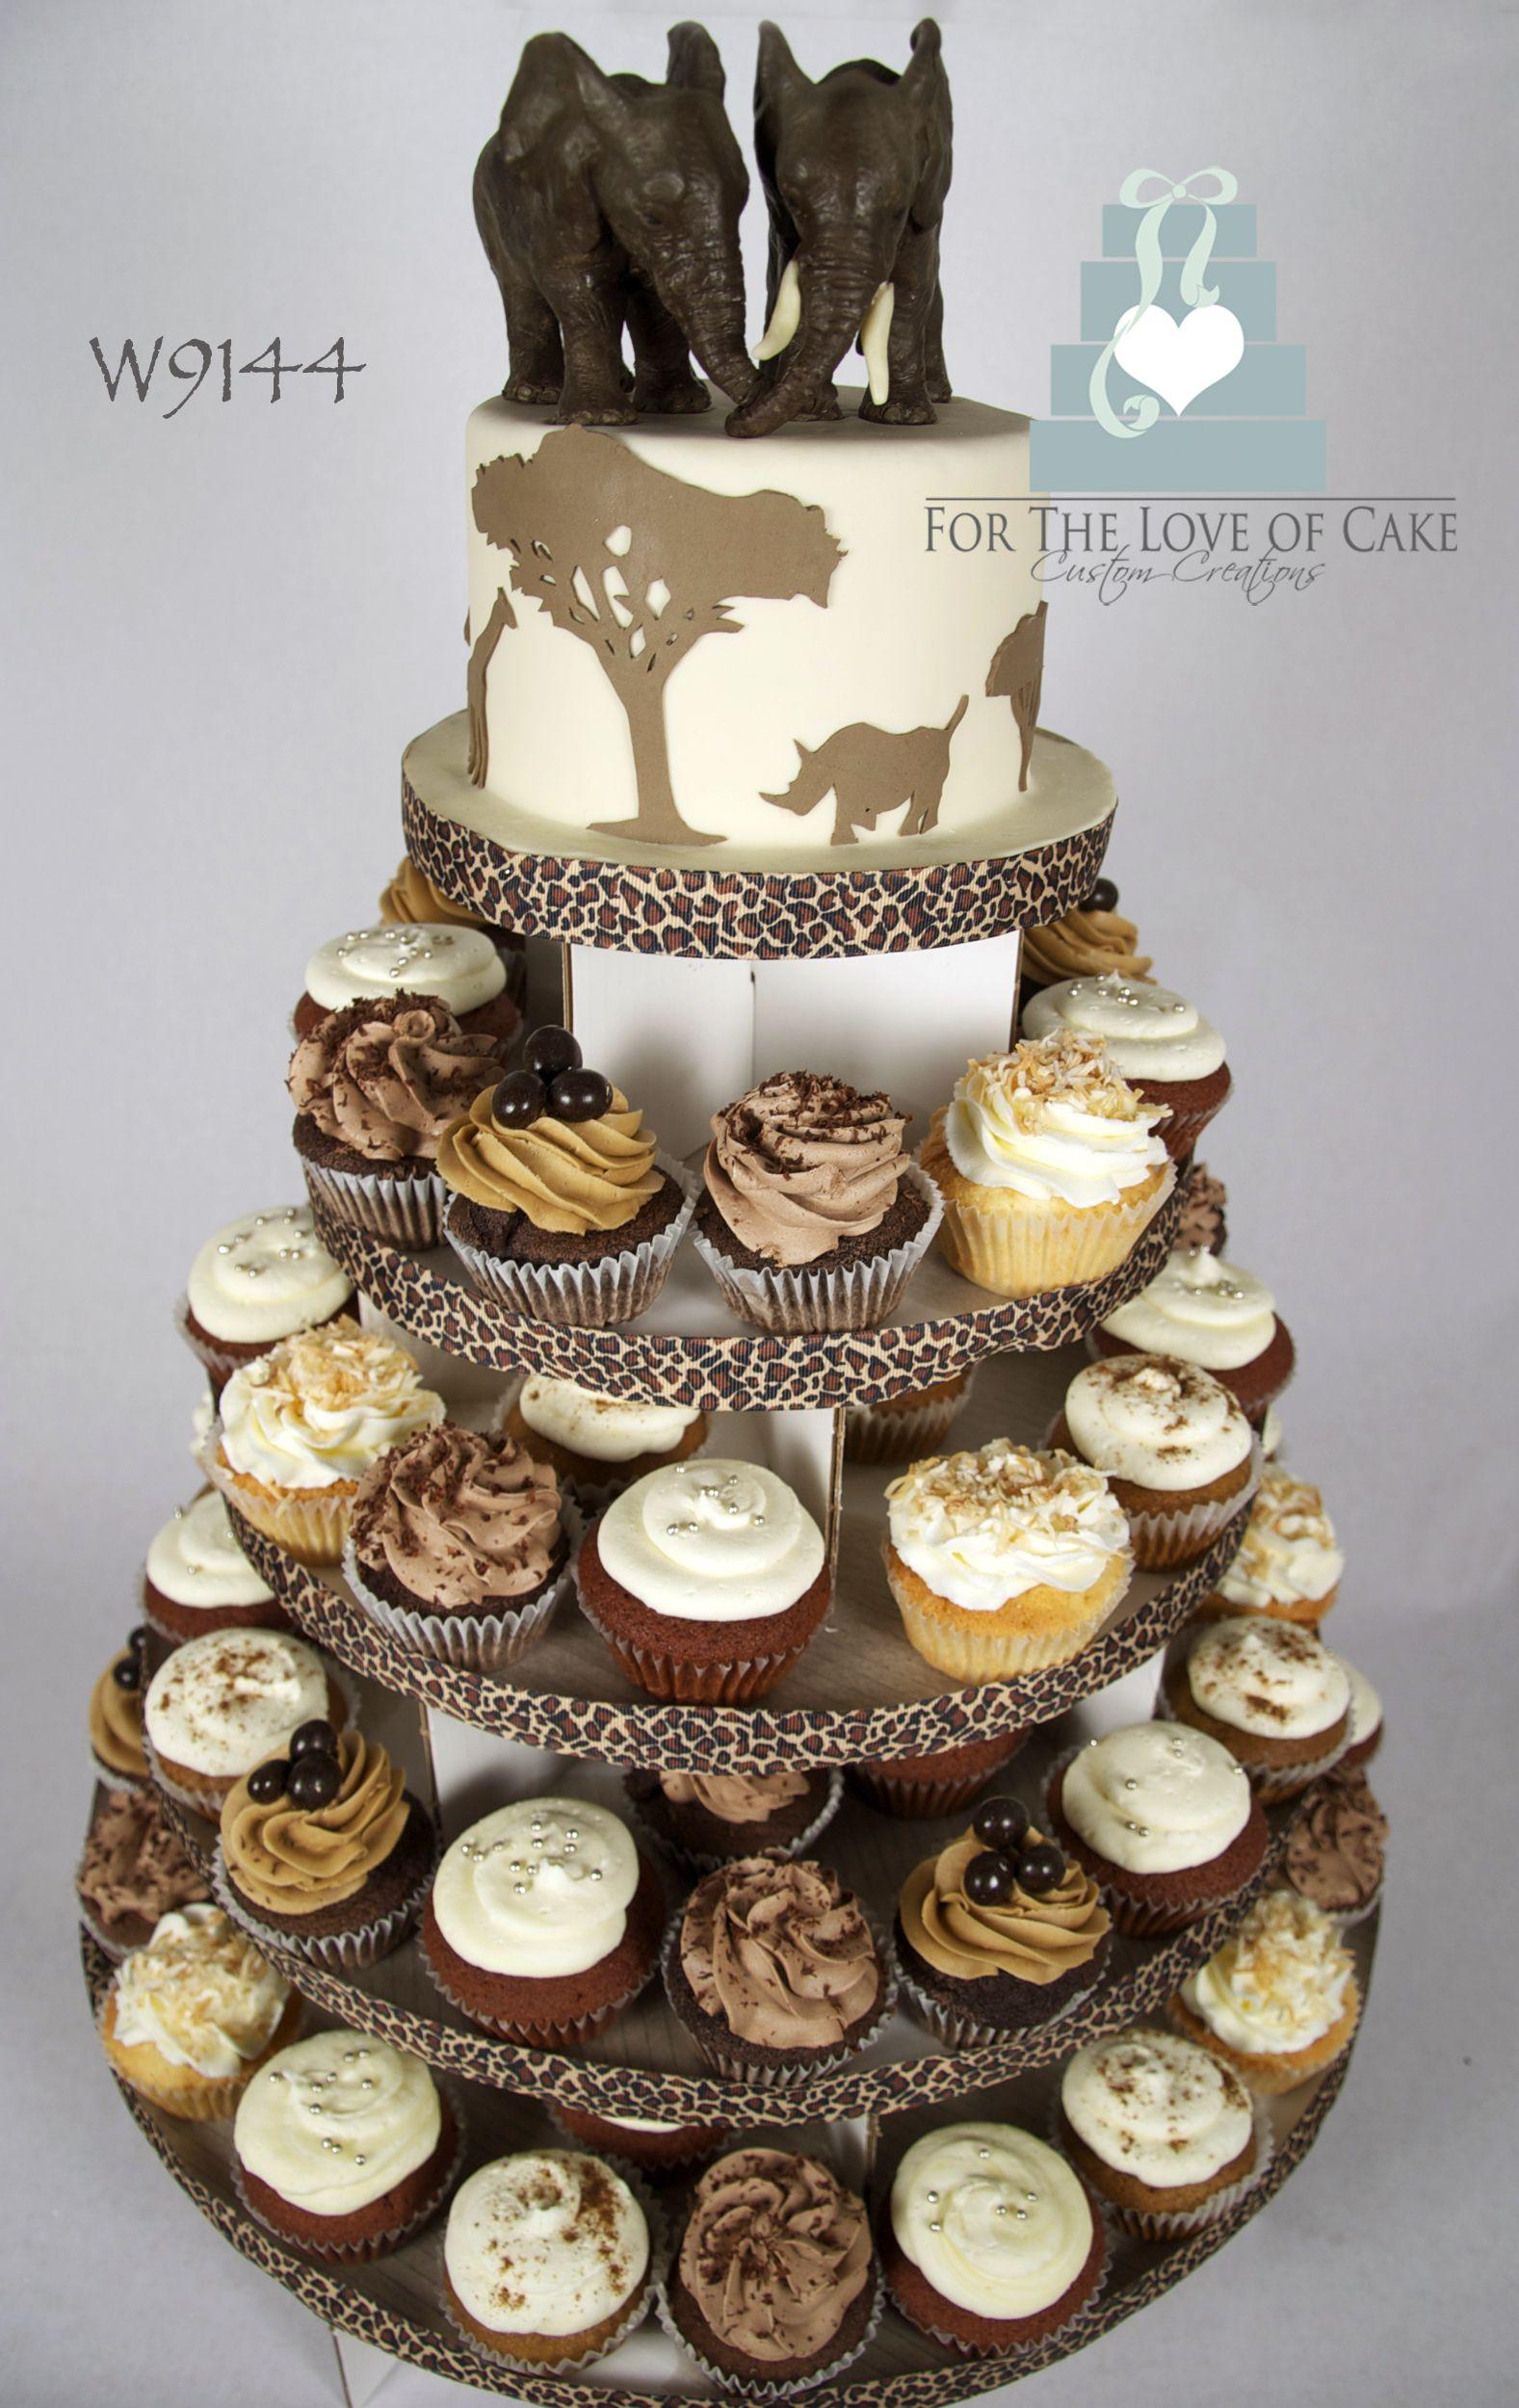 Safari Theme Cupcake Tower A 6 Round Safari Theme Cake With